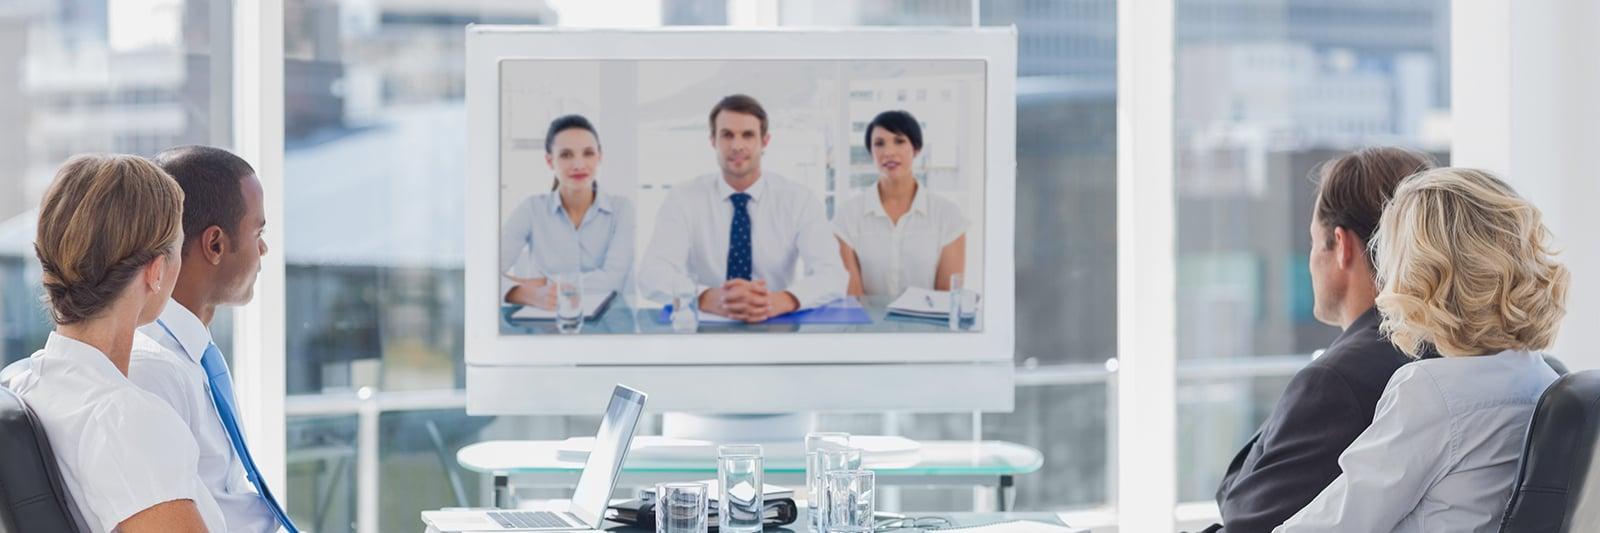 bigstock-Business-team-having-video-con-55903958